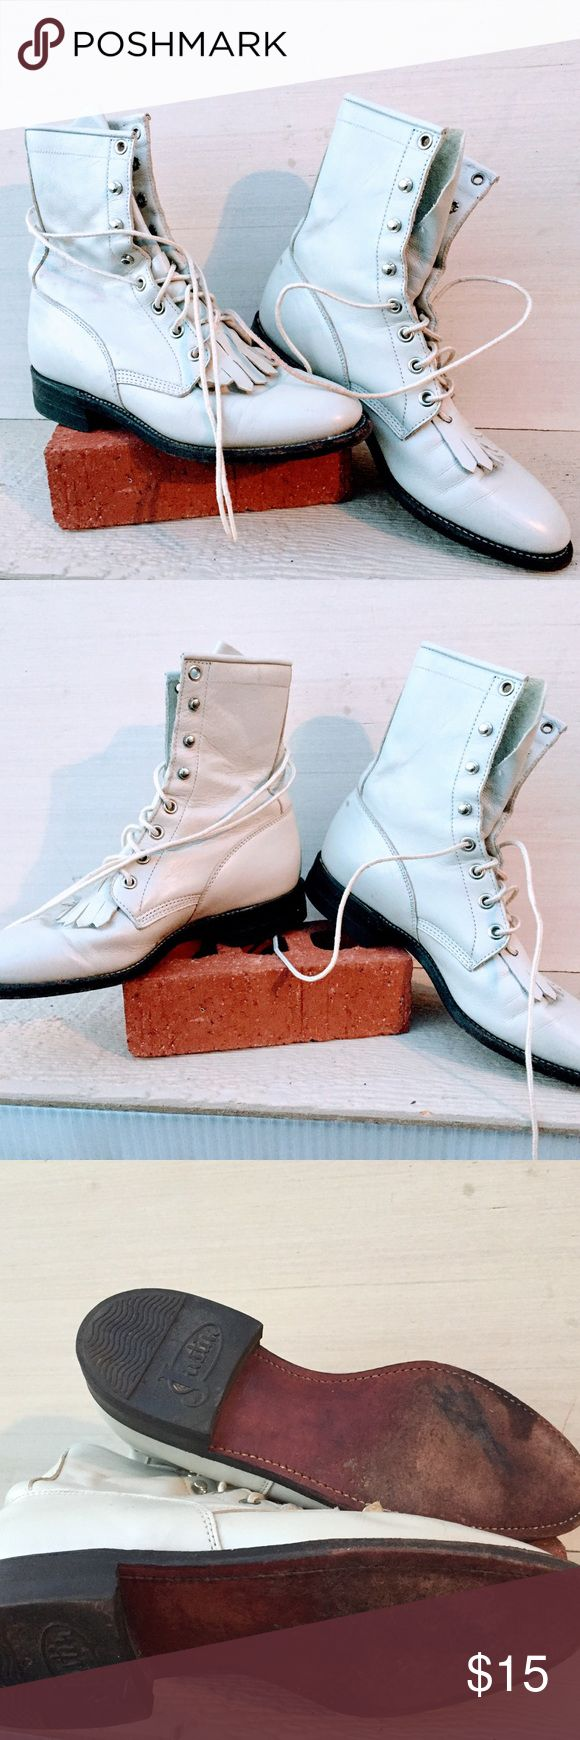 Justin White Roper. size 5 Justin White Roper. Size 5 heel B,8-inch tall Women's Justin roper boot with a roper toe, a roper heel Justin Boots Shoes Lace Up Boots